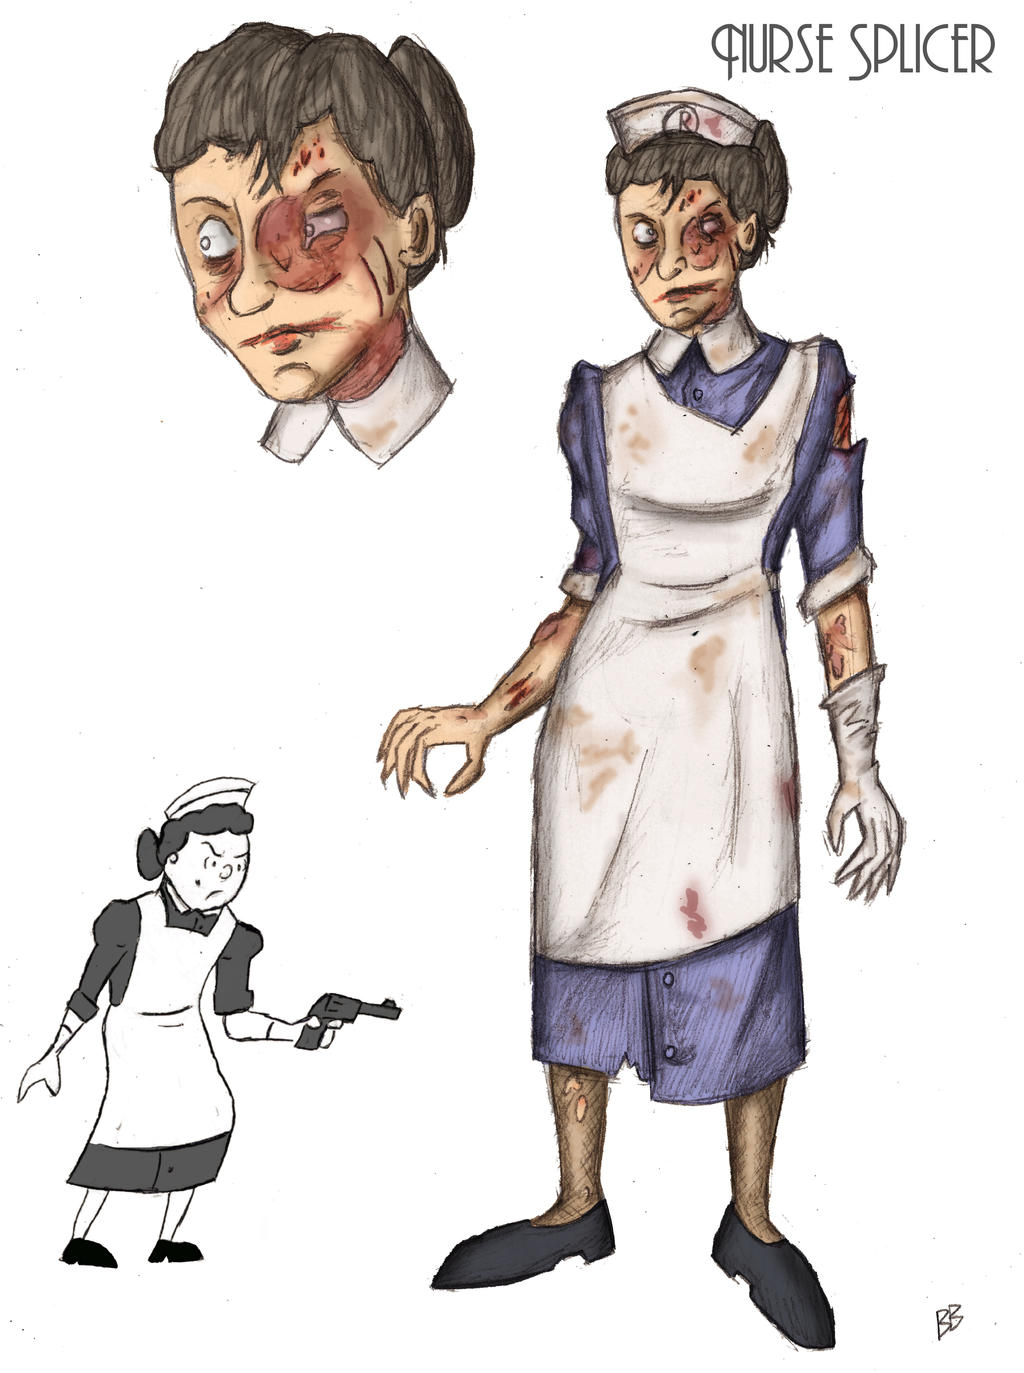 Bioshock: Nurse Splicer by charle88